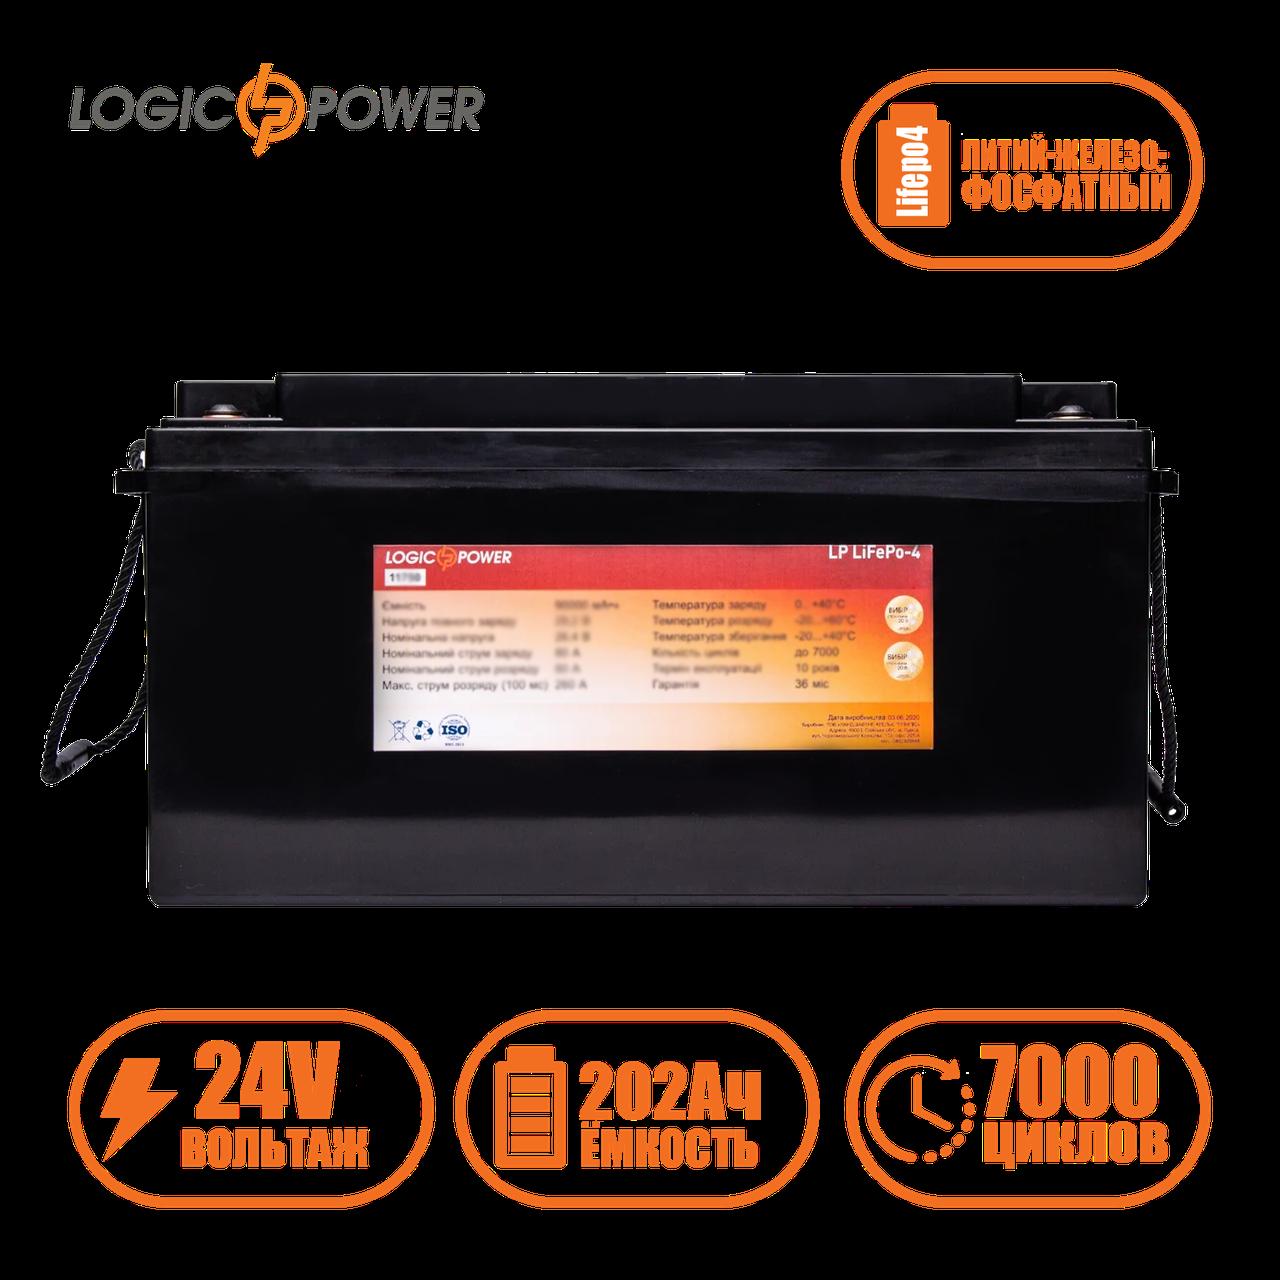 Аккумулятор LP LiFePo-4 24 V - 202 Ah (BMS 60A) пластик